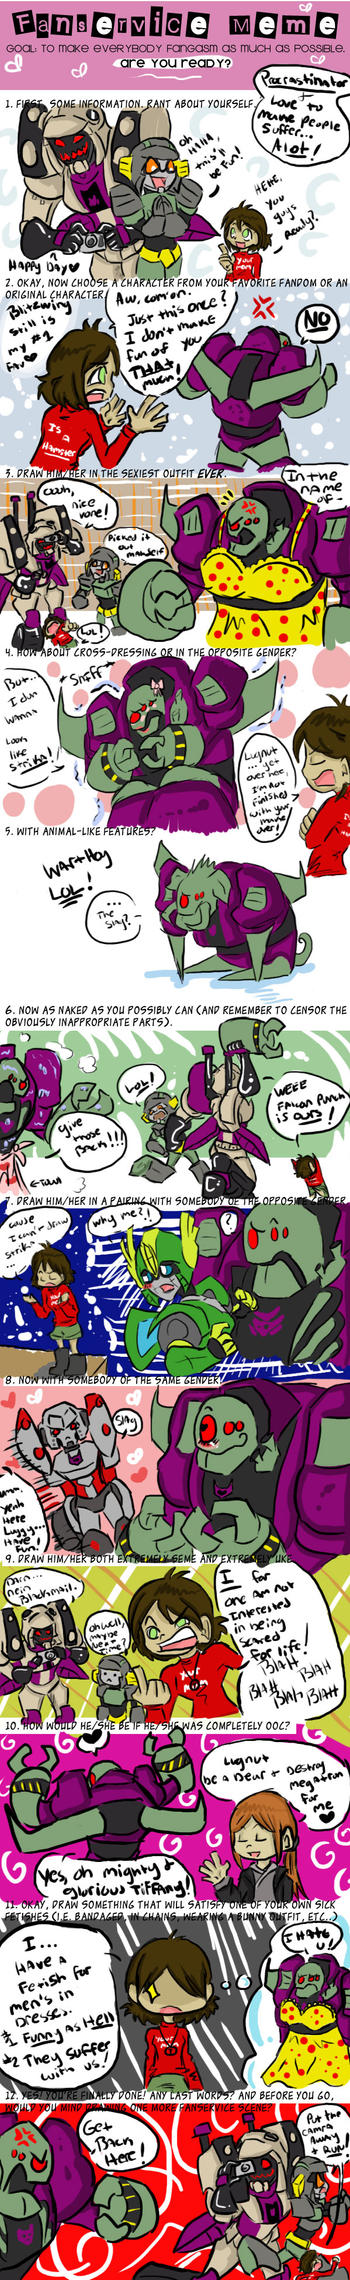 Lugnuts Fanservice Meme by AccidentProneComics